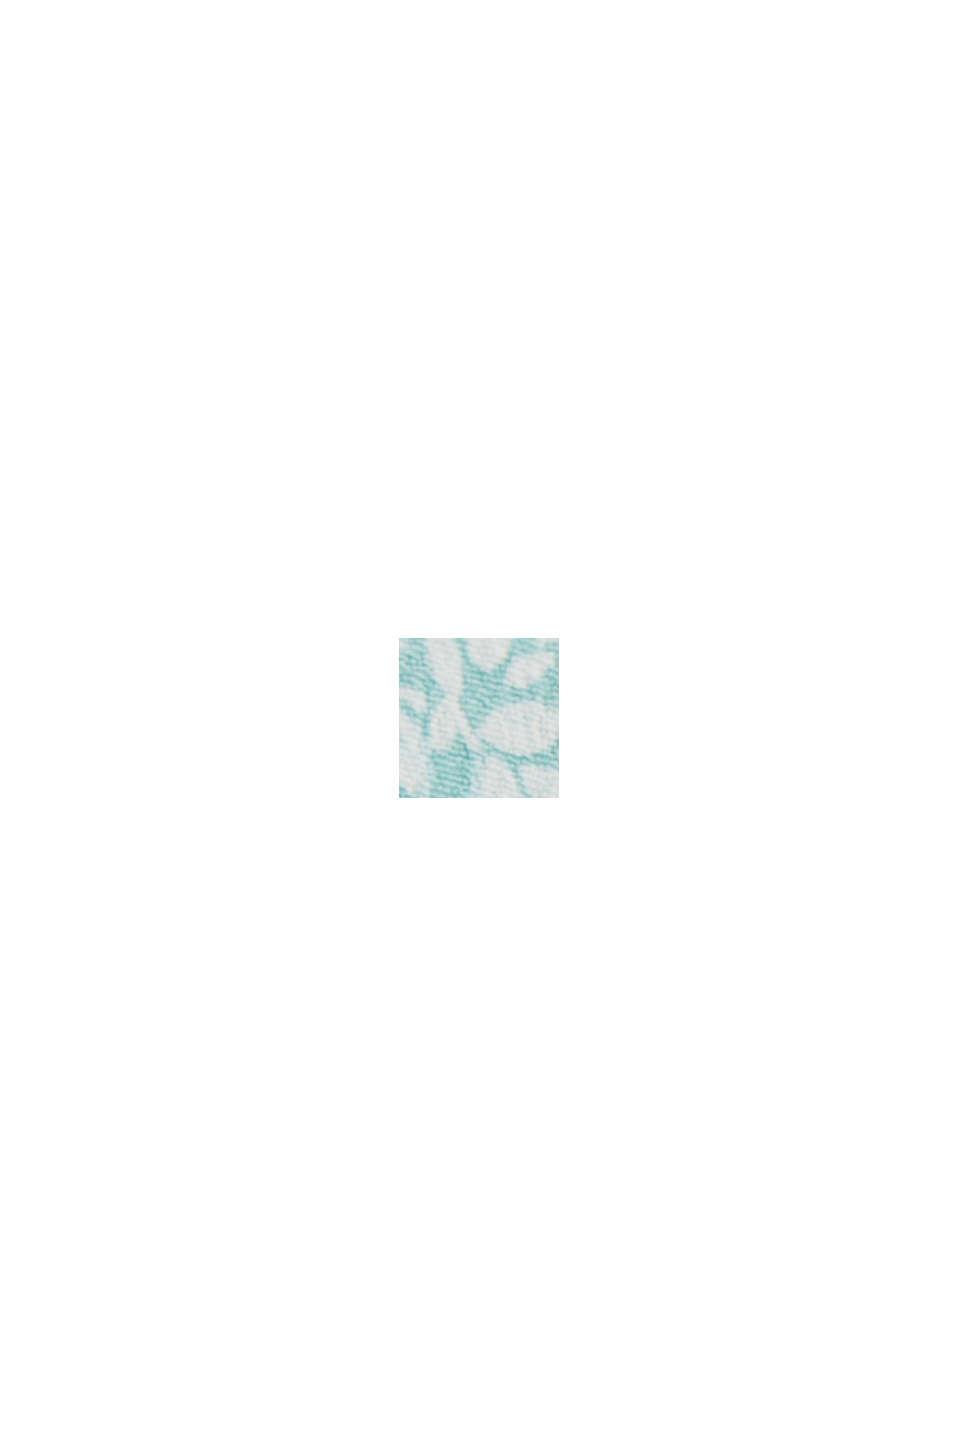 CURVY Blusentop mit floralem Print, TURQUOISE, swatch